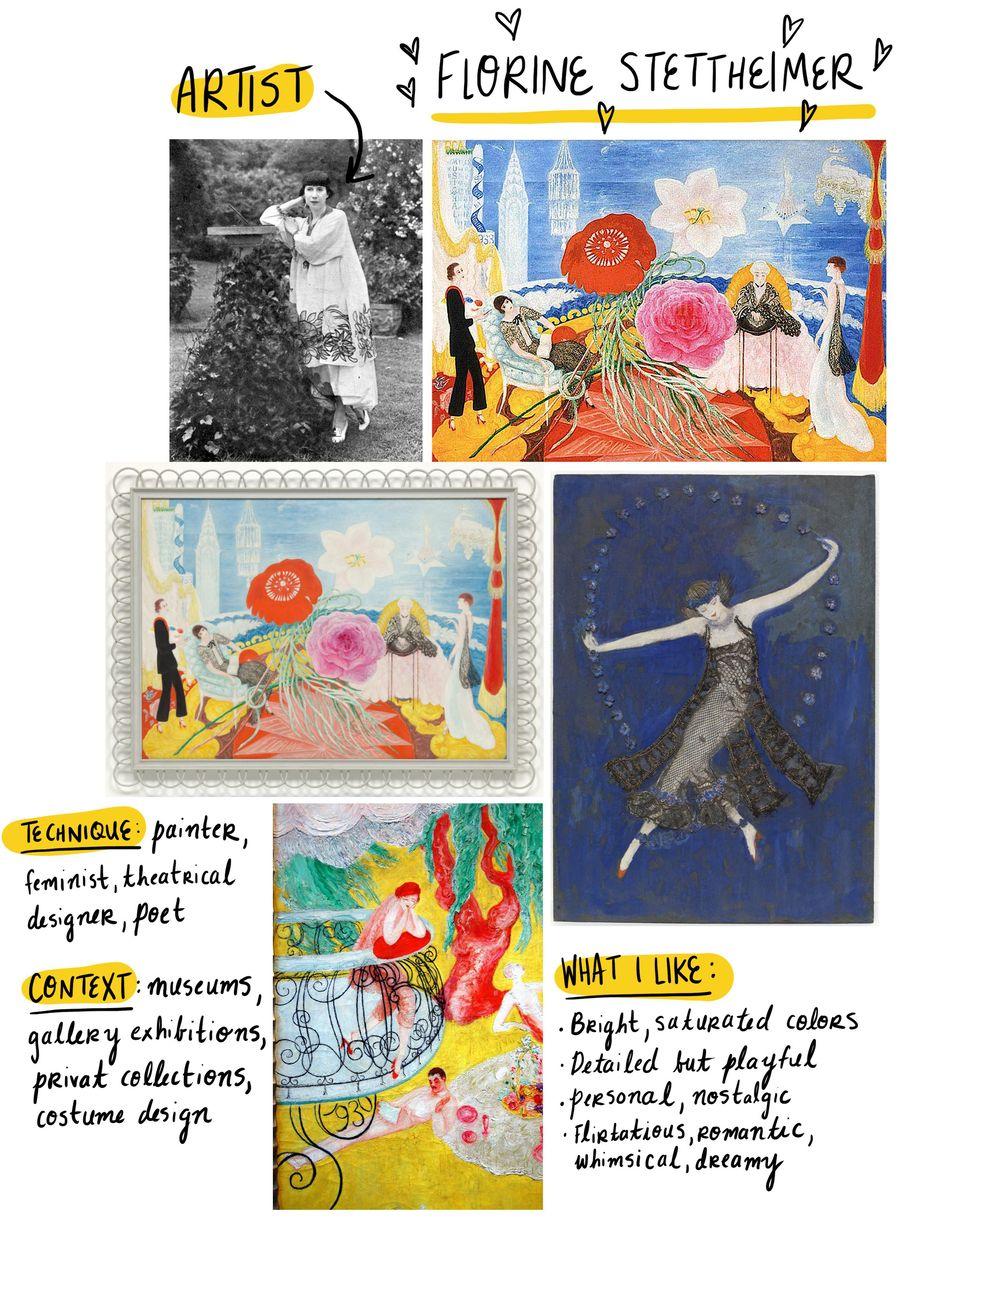 Pilot Illustrations - image 7 - student project